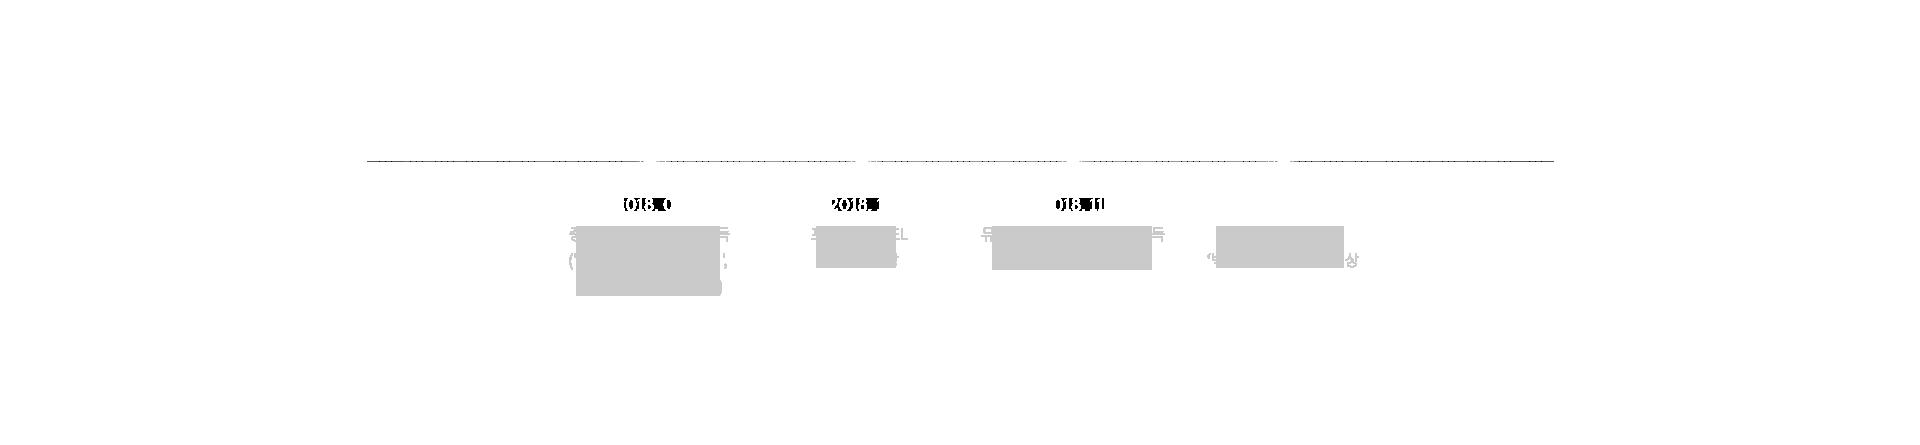 history_2018